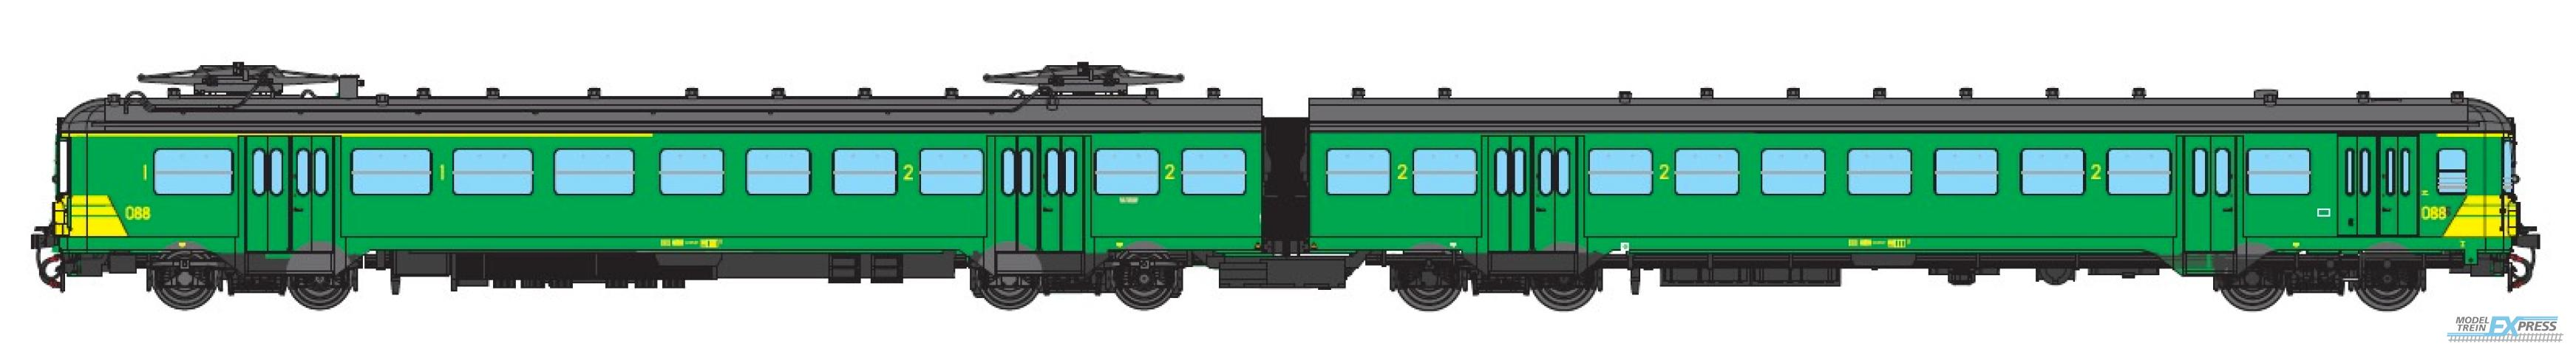 B-Models 7003.02L